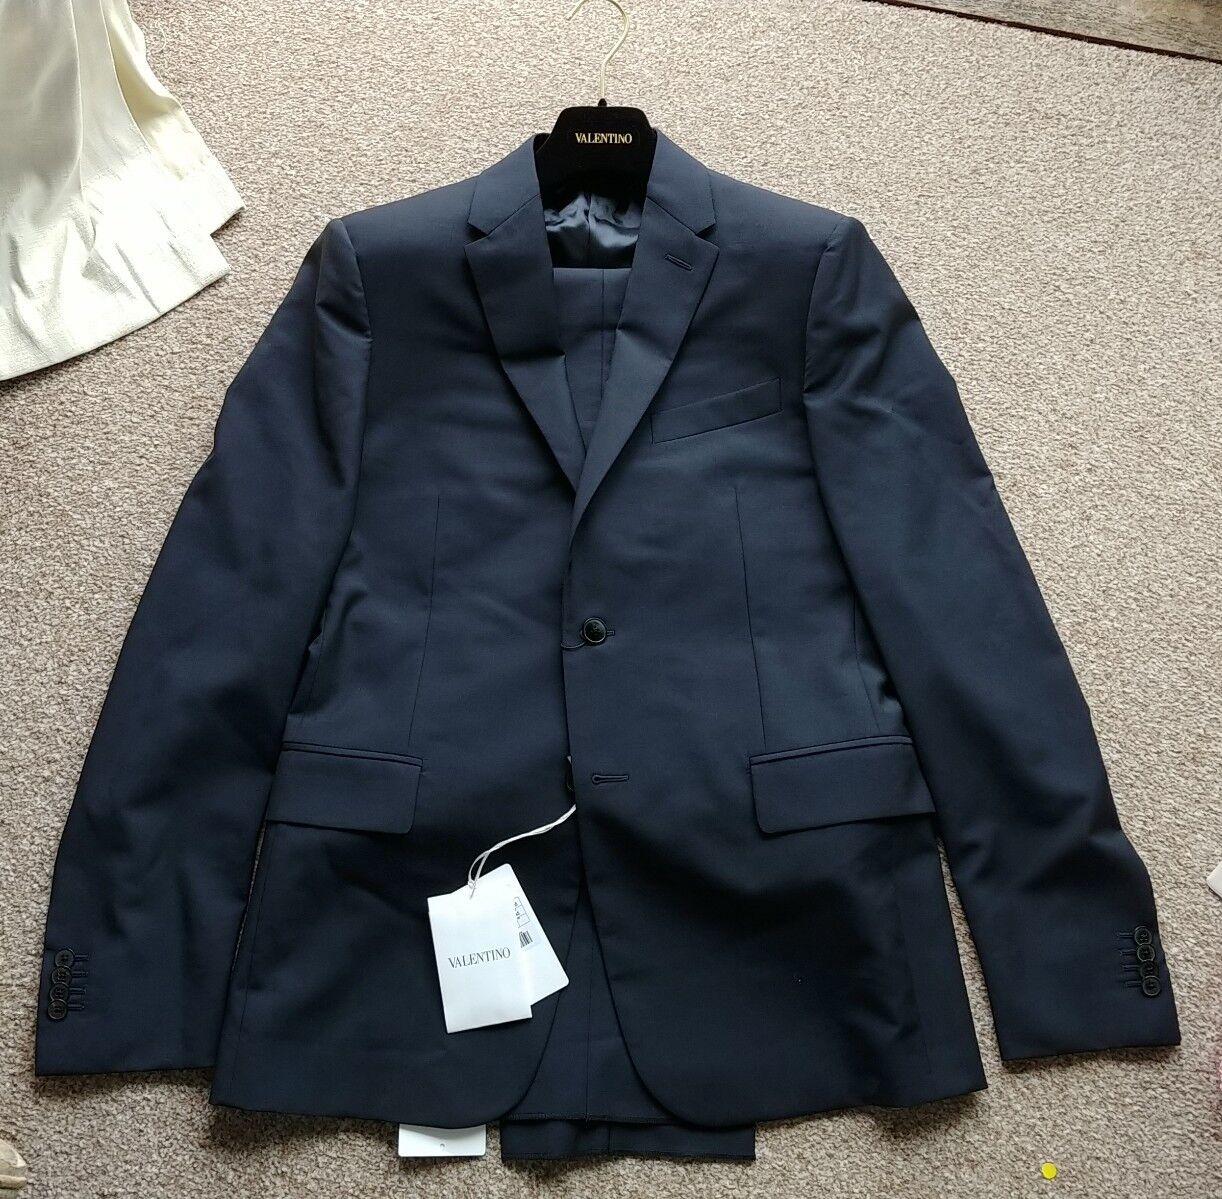 Valentino Suit Navy EU48 UK38 BNWT (has VC Guarantee) Wool Mohair